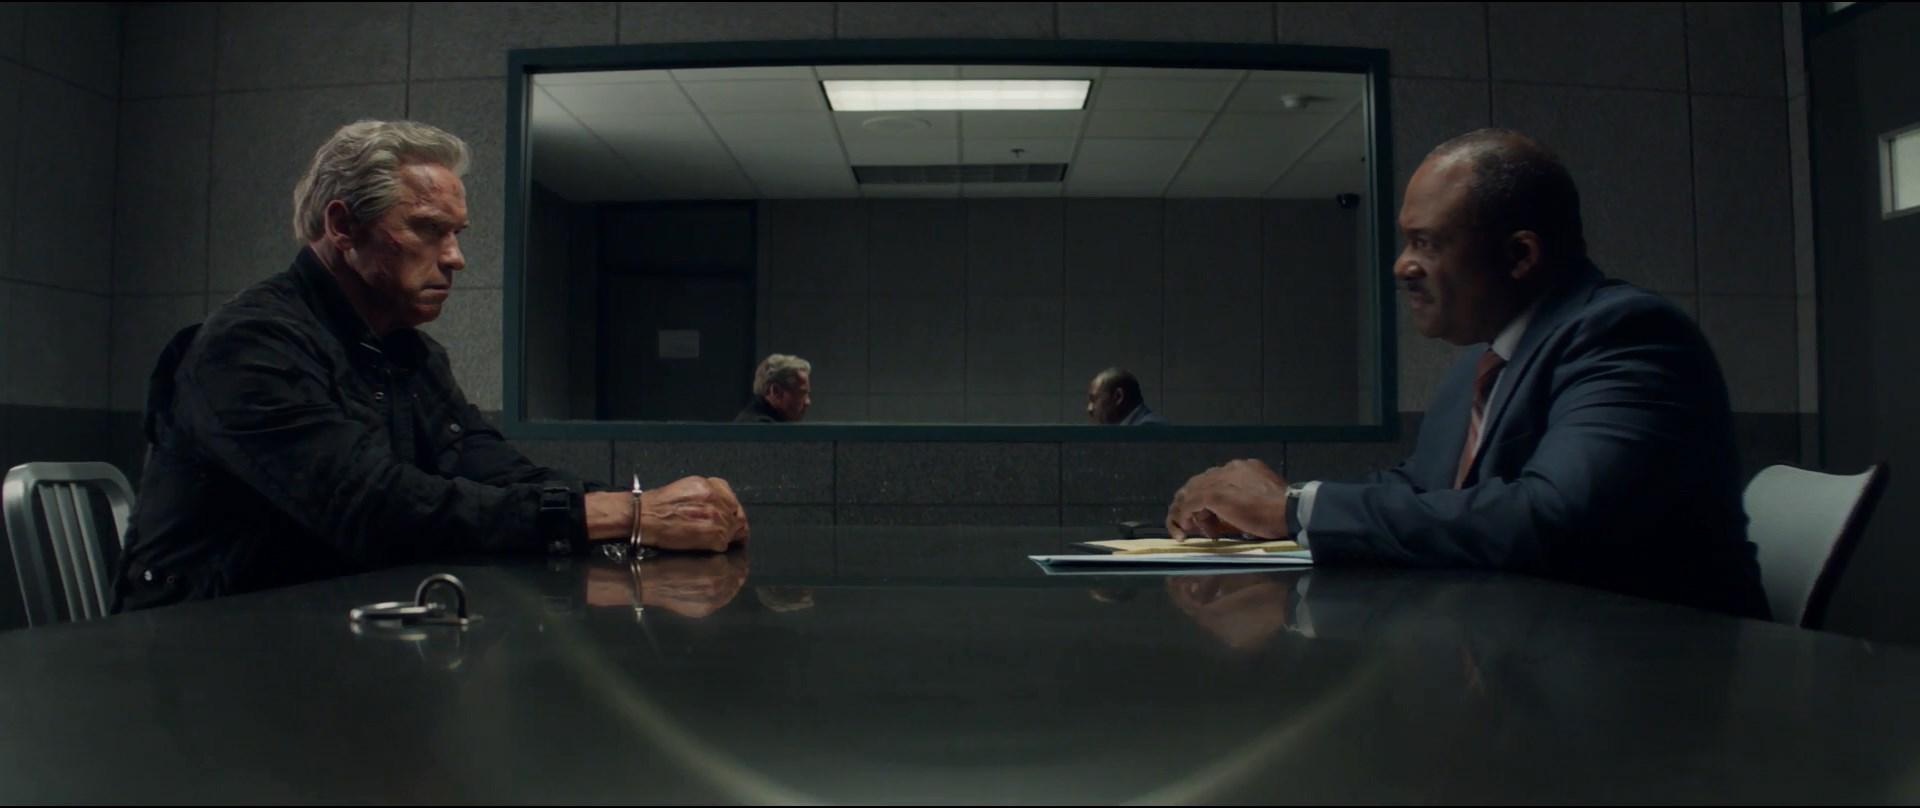 File:Tg-pops-film-harding-interrogation.jpg